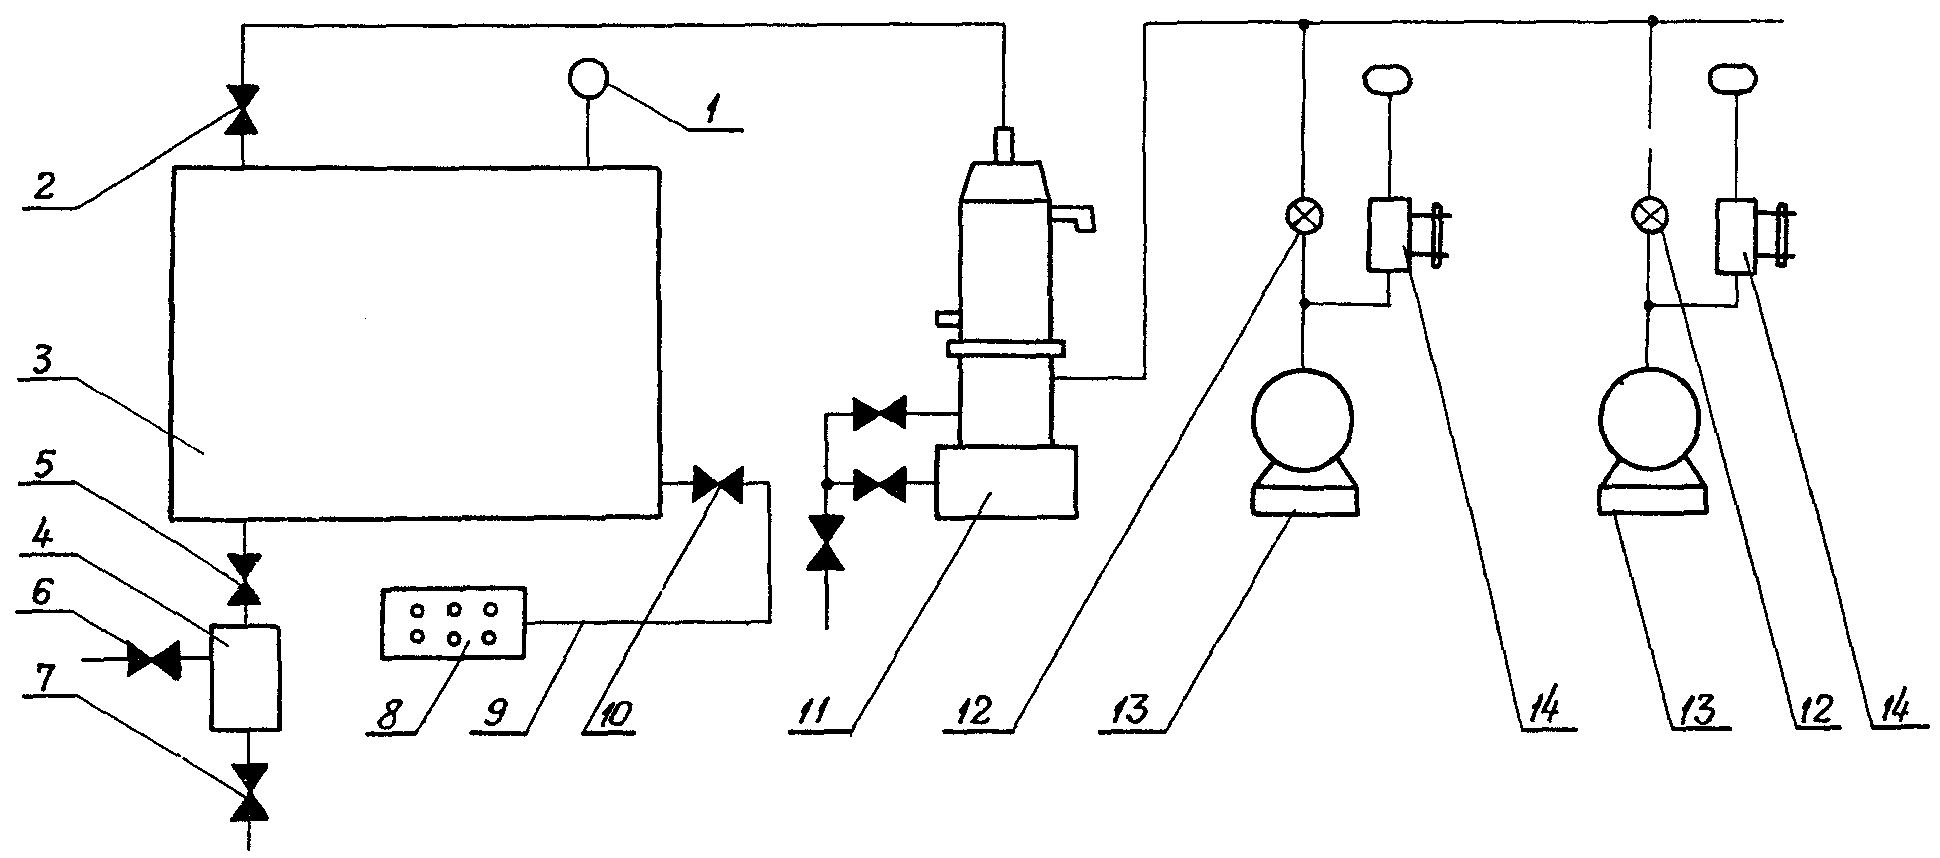 шкаф дутья силового трансформатора схема